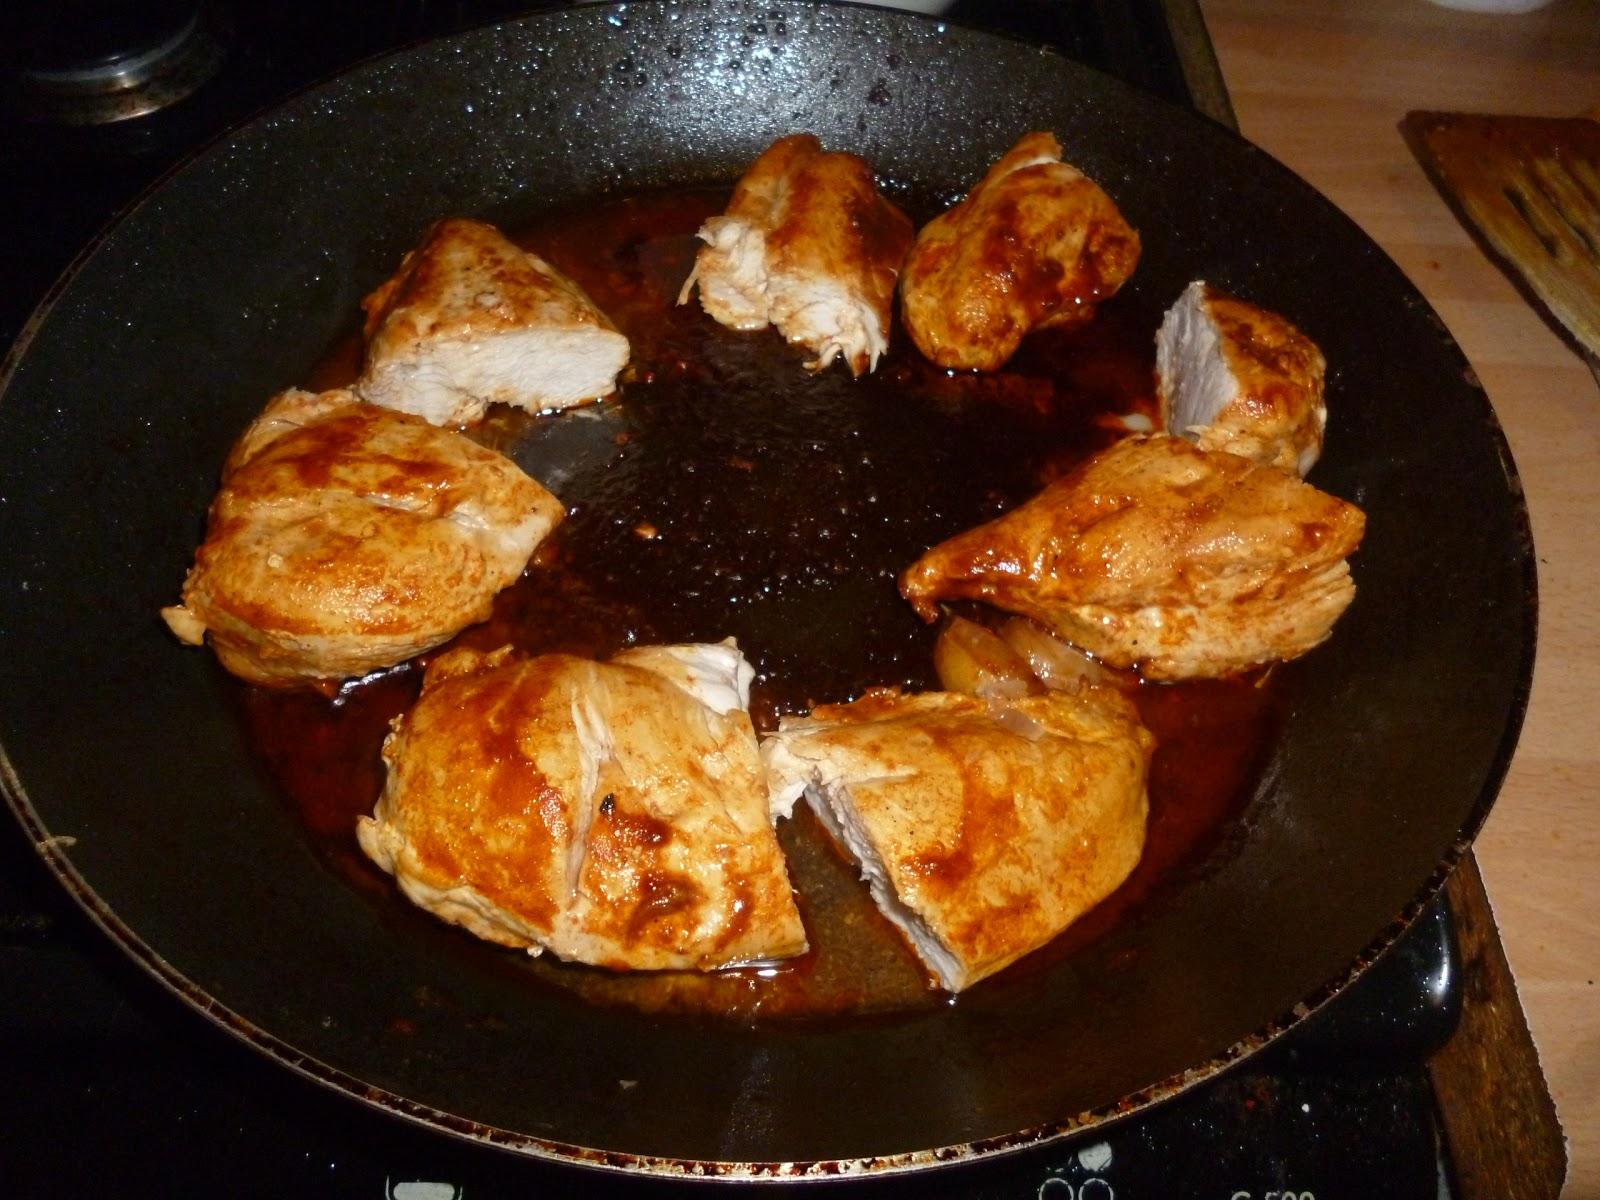 Jose Pizarro's Pan-Fried Chicken With Mashed Potato Recipe ...